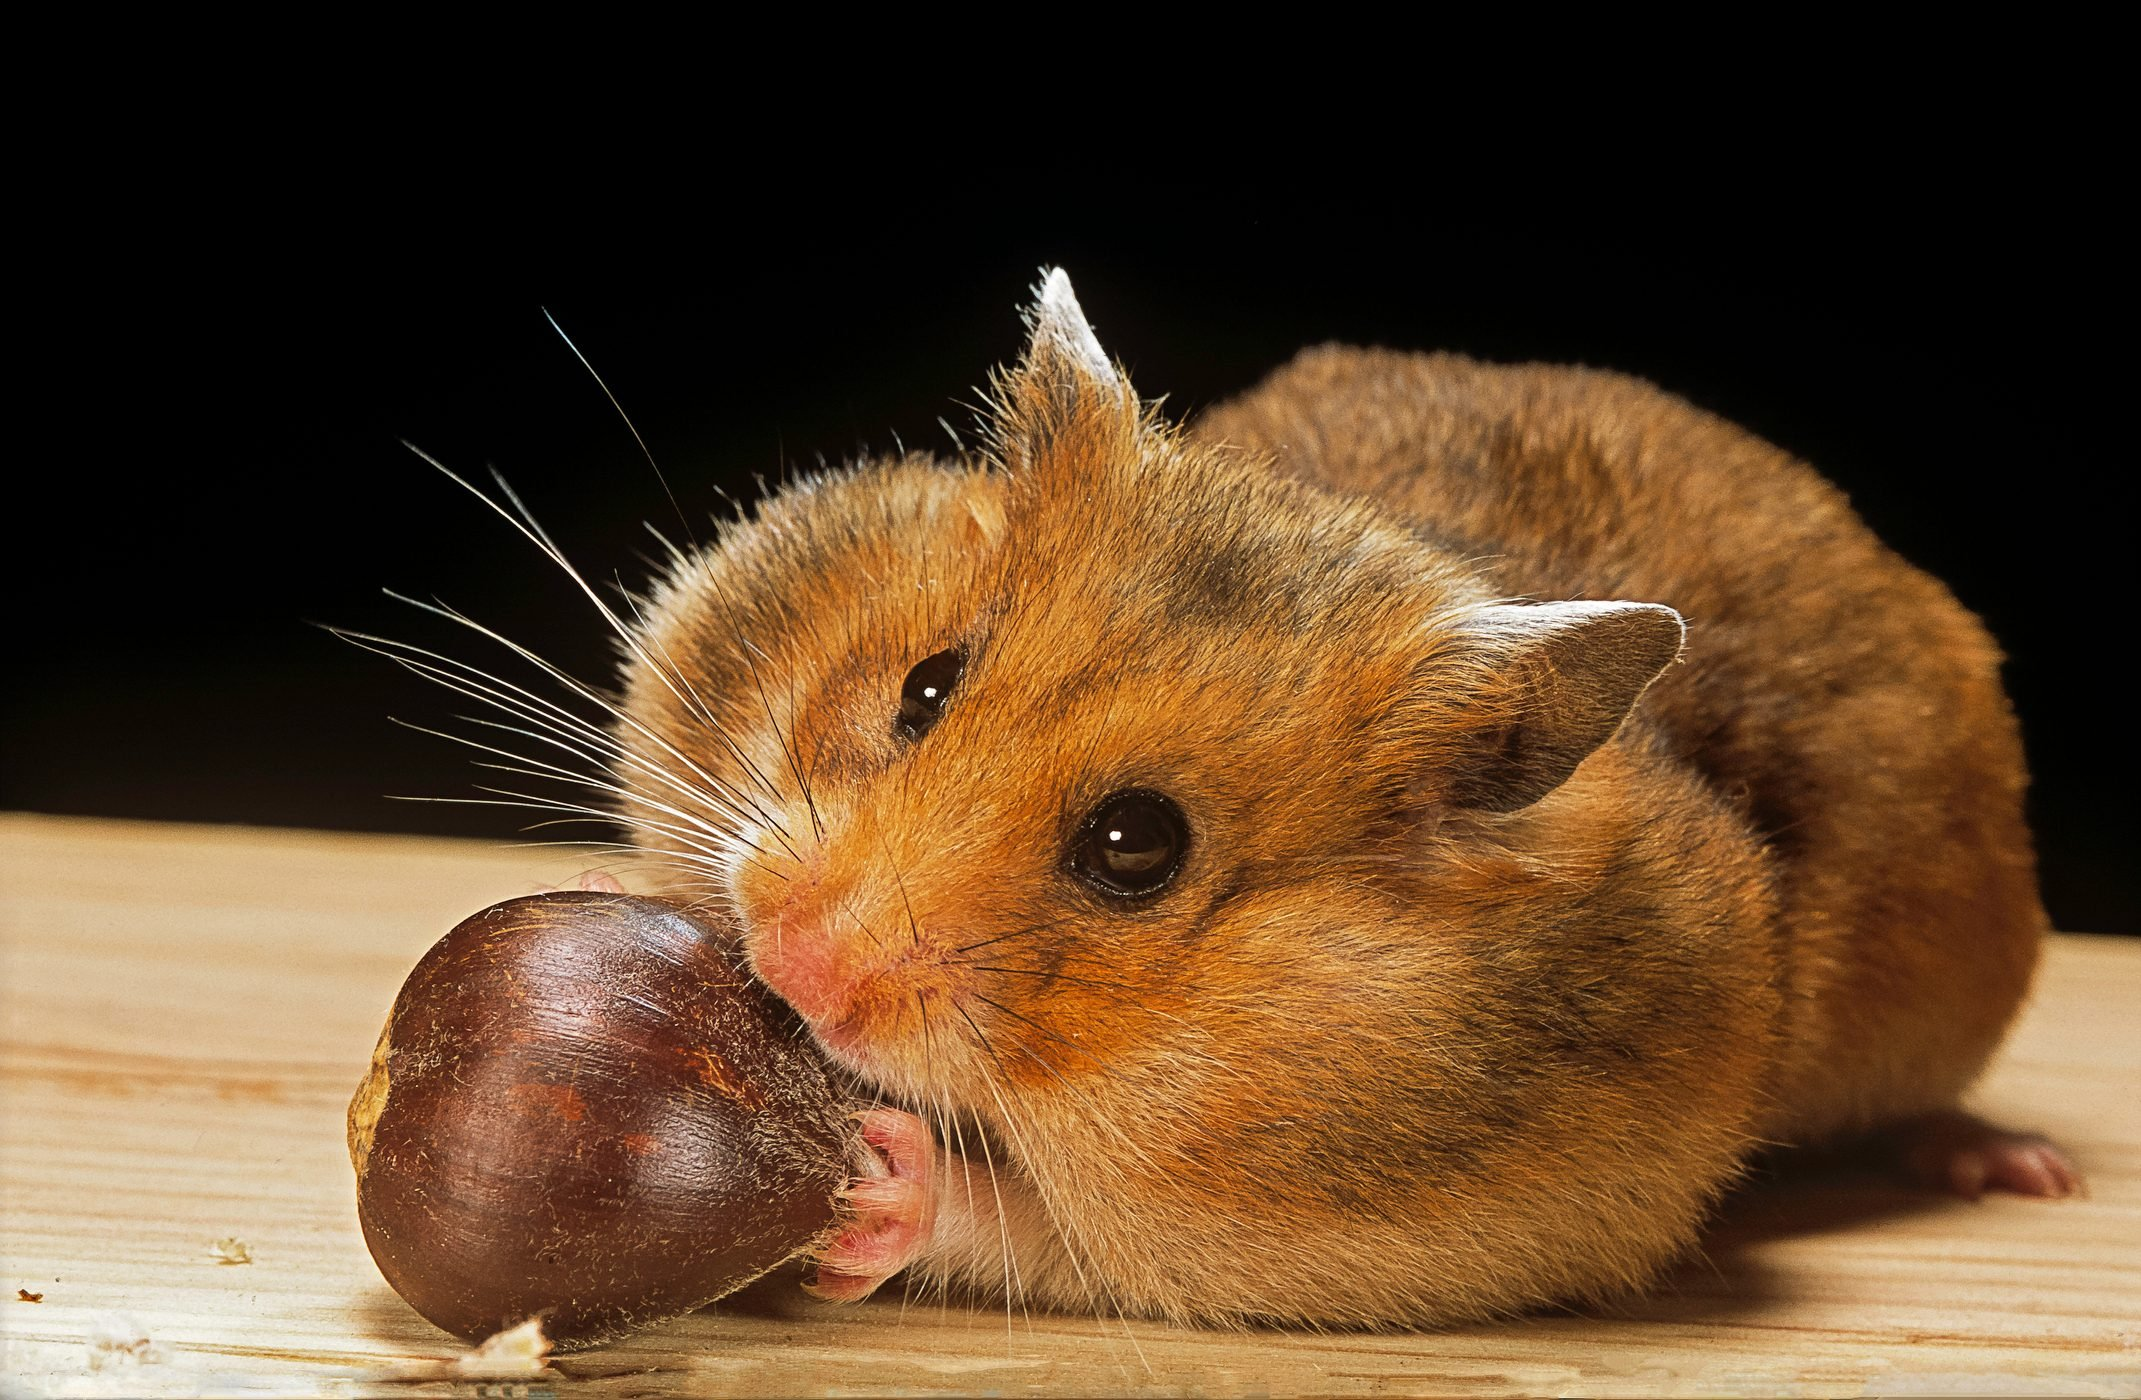 Mesocricetus auratus (golden hamster, Syrian hamster) - feeding on a chestnut